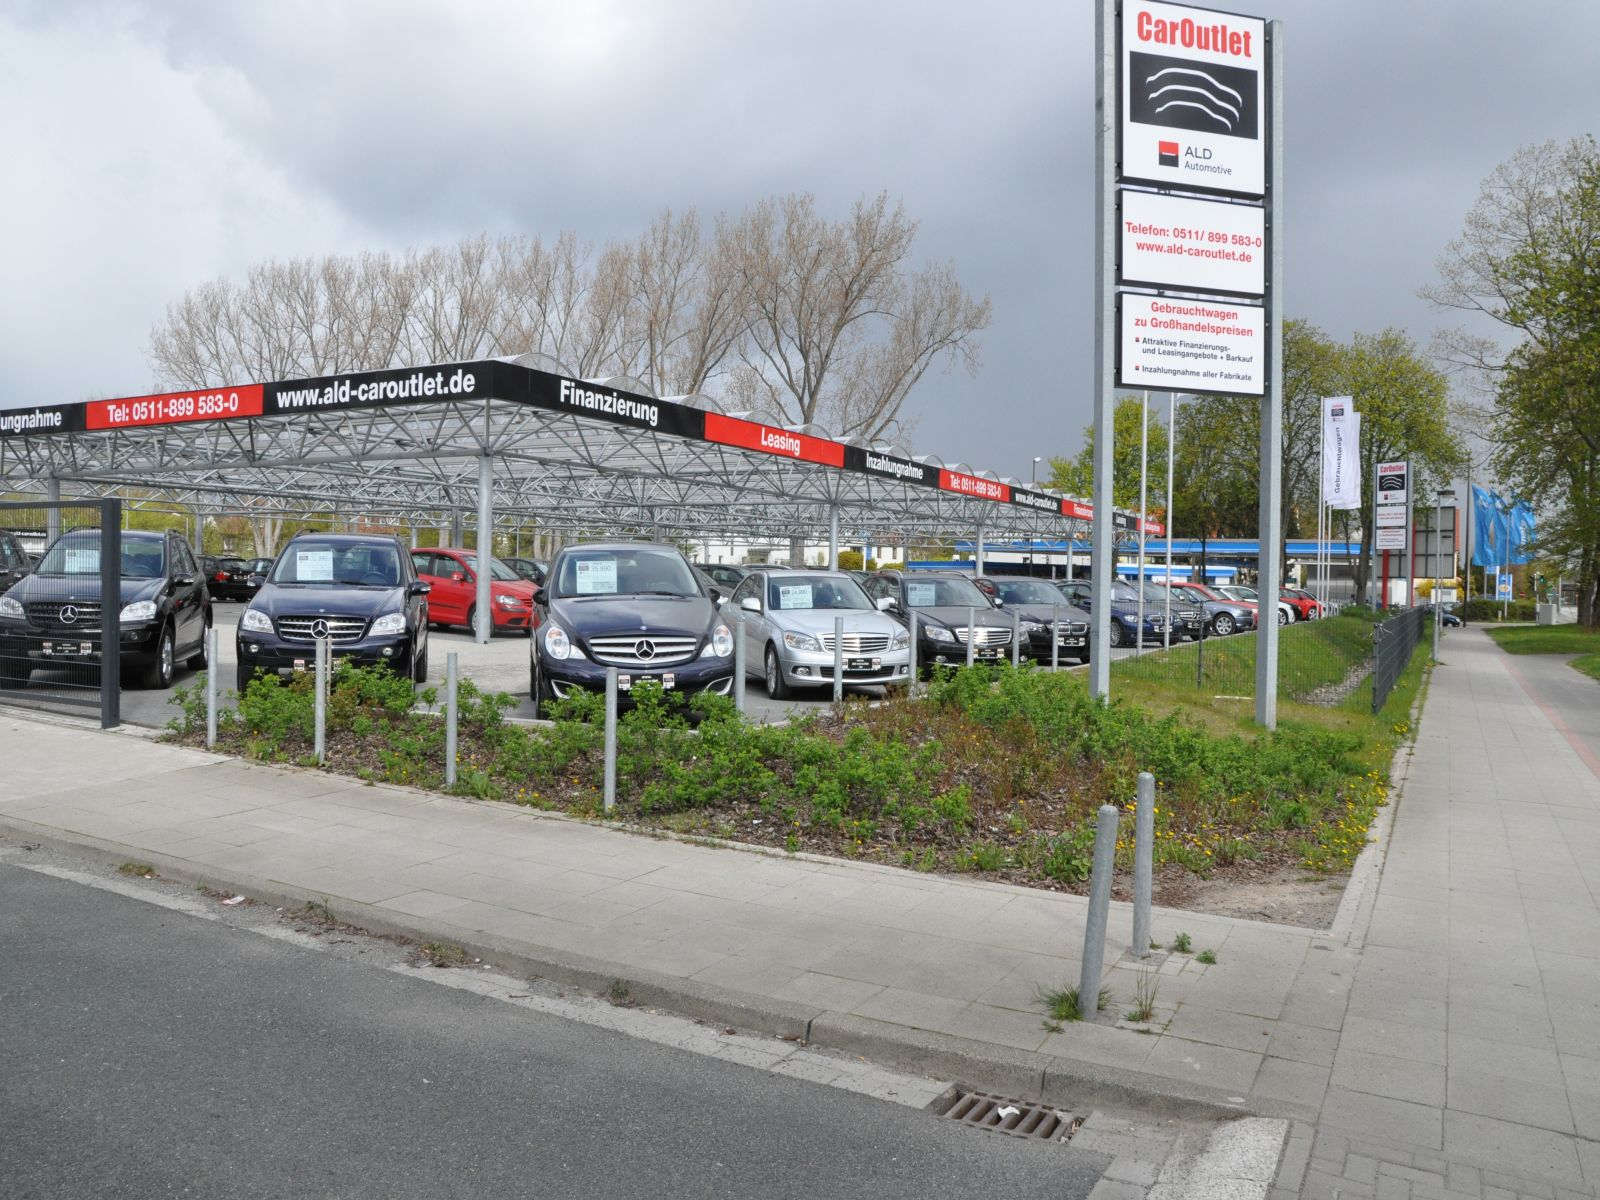 Hannover Outlet loos studemund ingenieurgesellschaft mbh